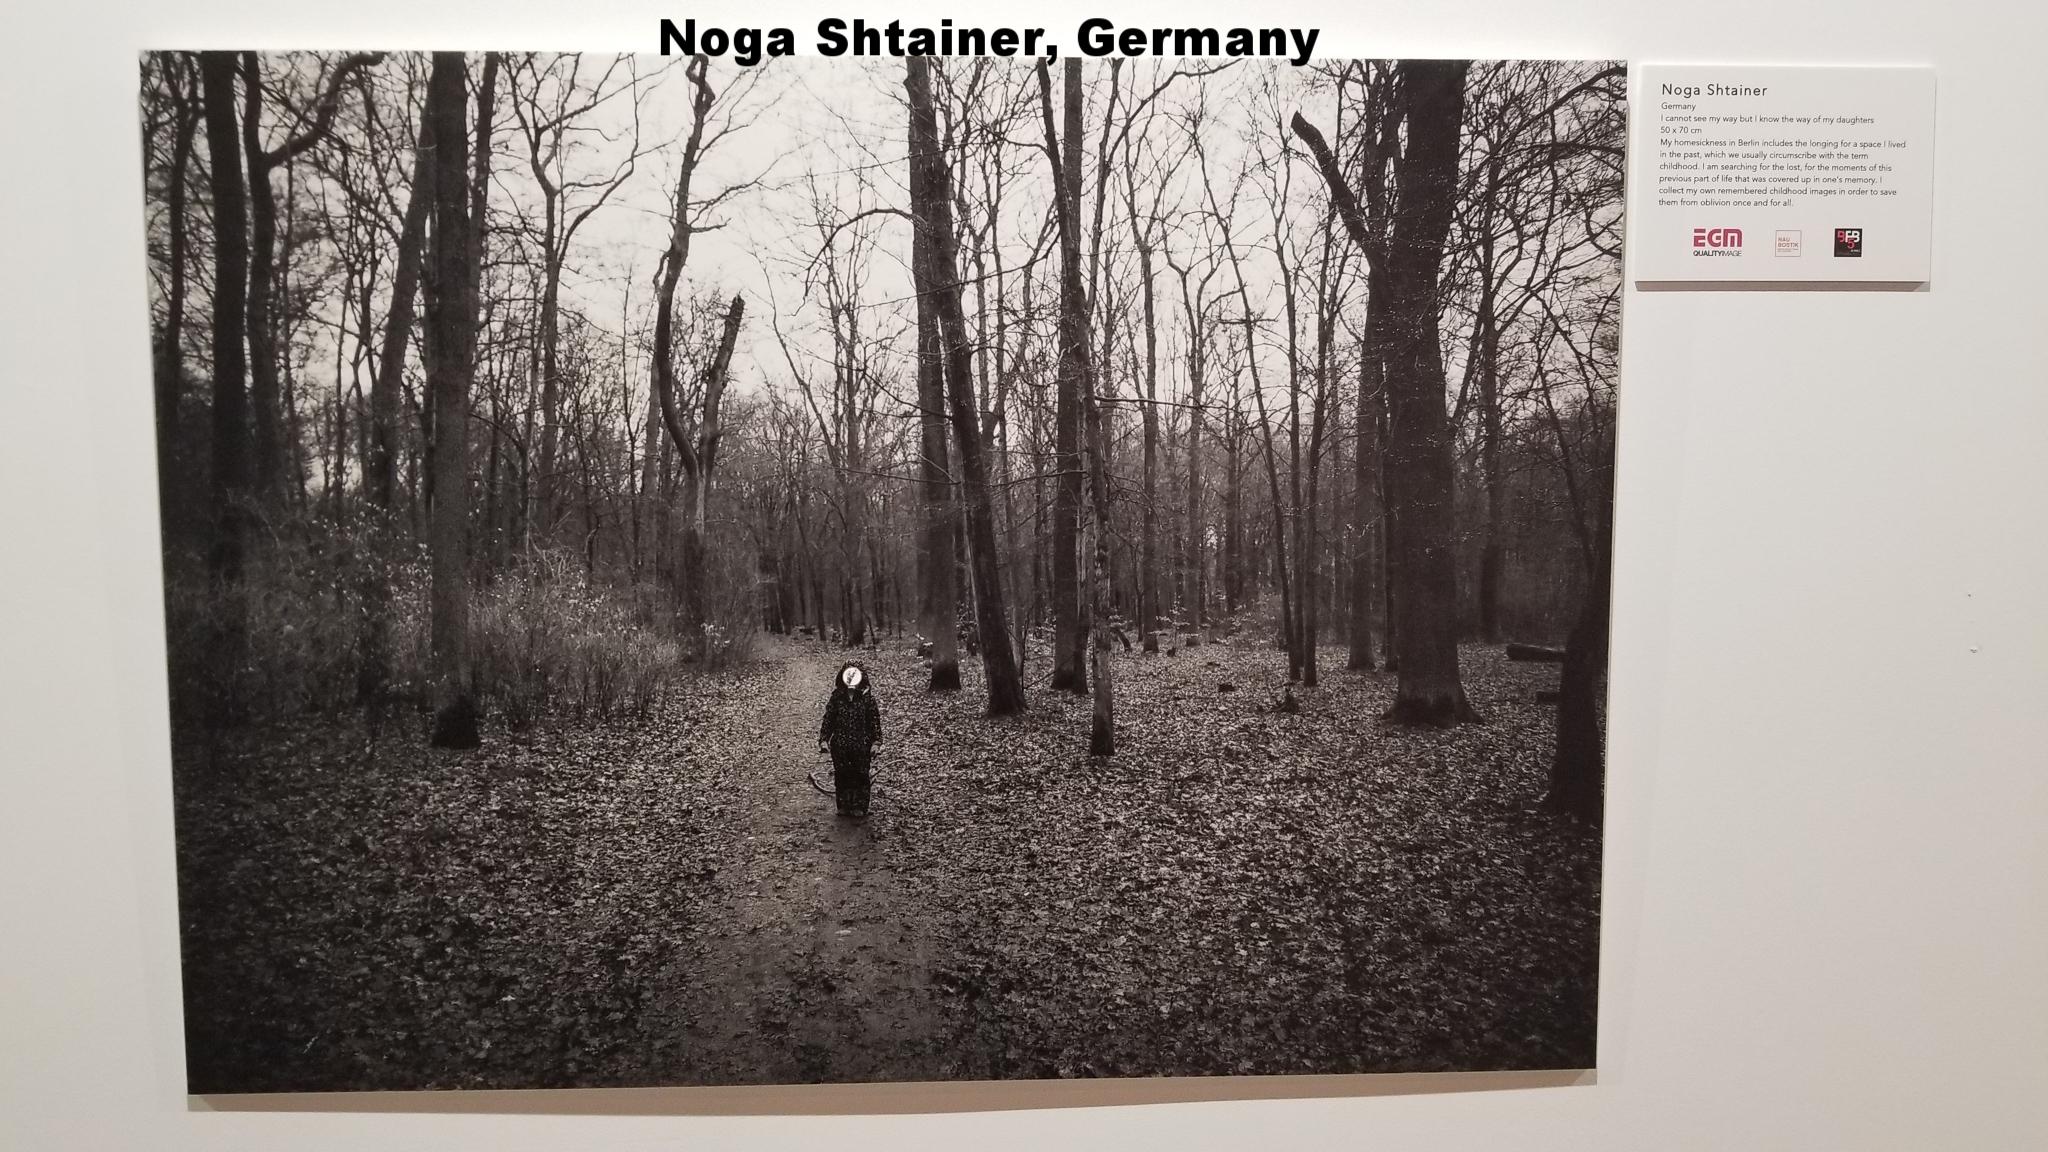 Noga Shtainer, Germany